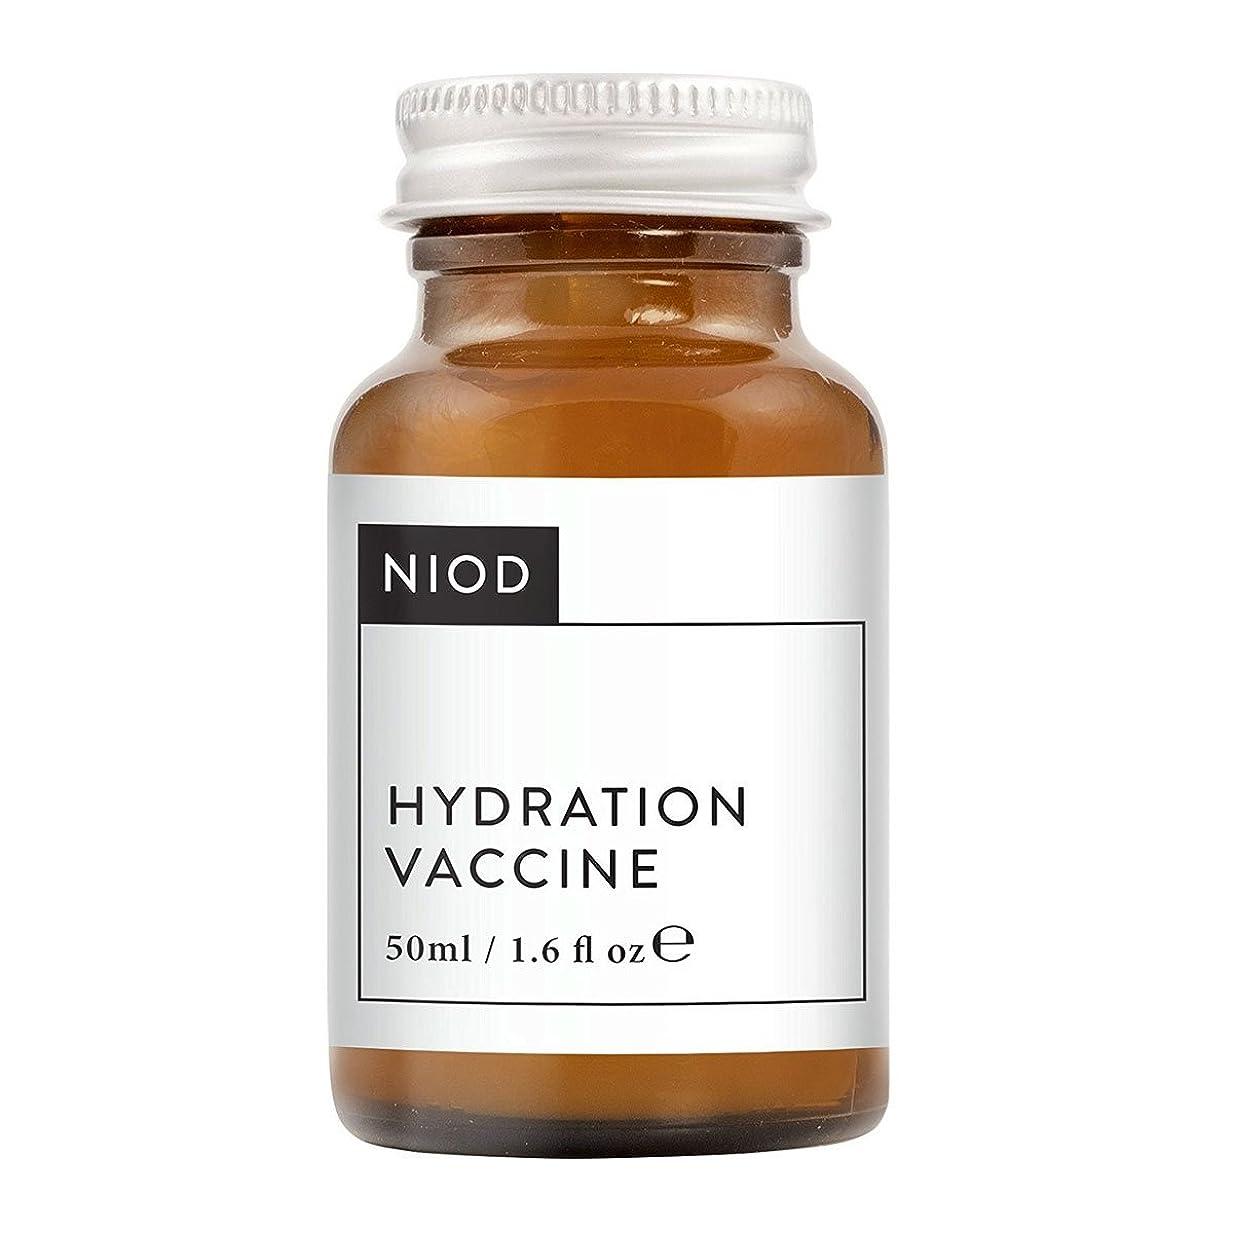 札入れ鹿委員長Niod Hydration Vaccine 50ml [並行輸入品]